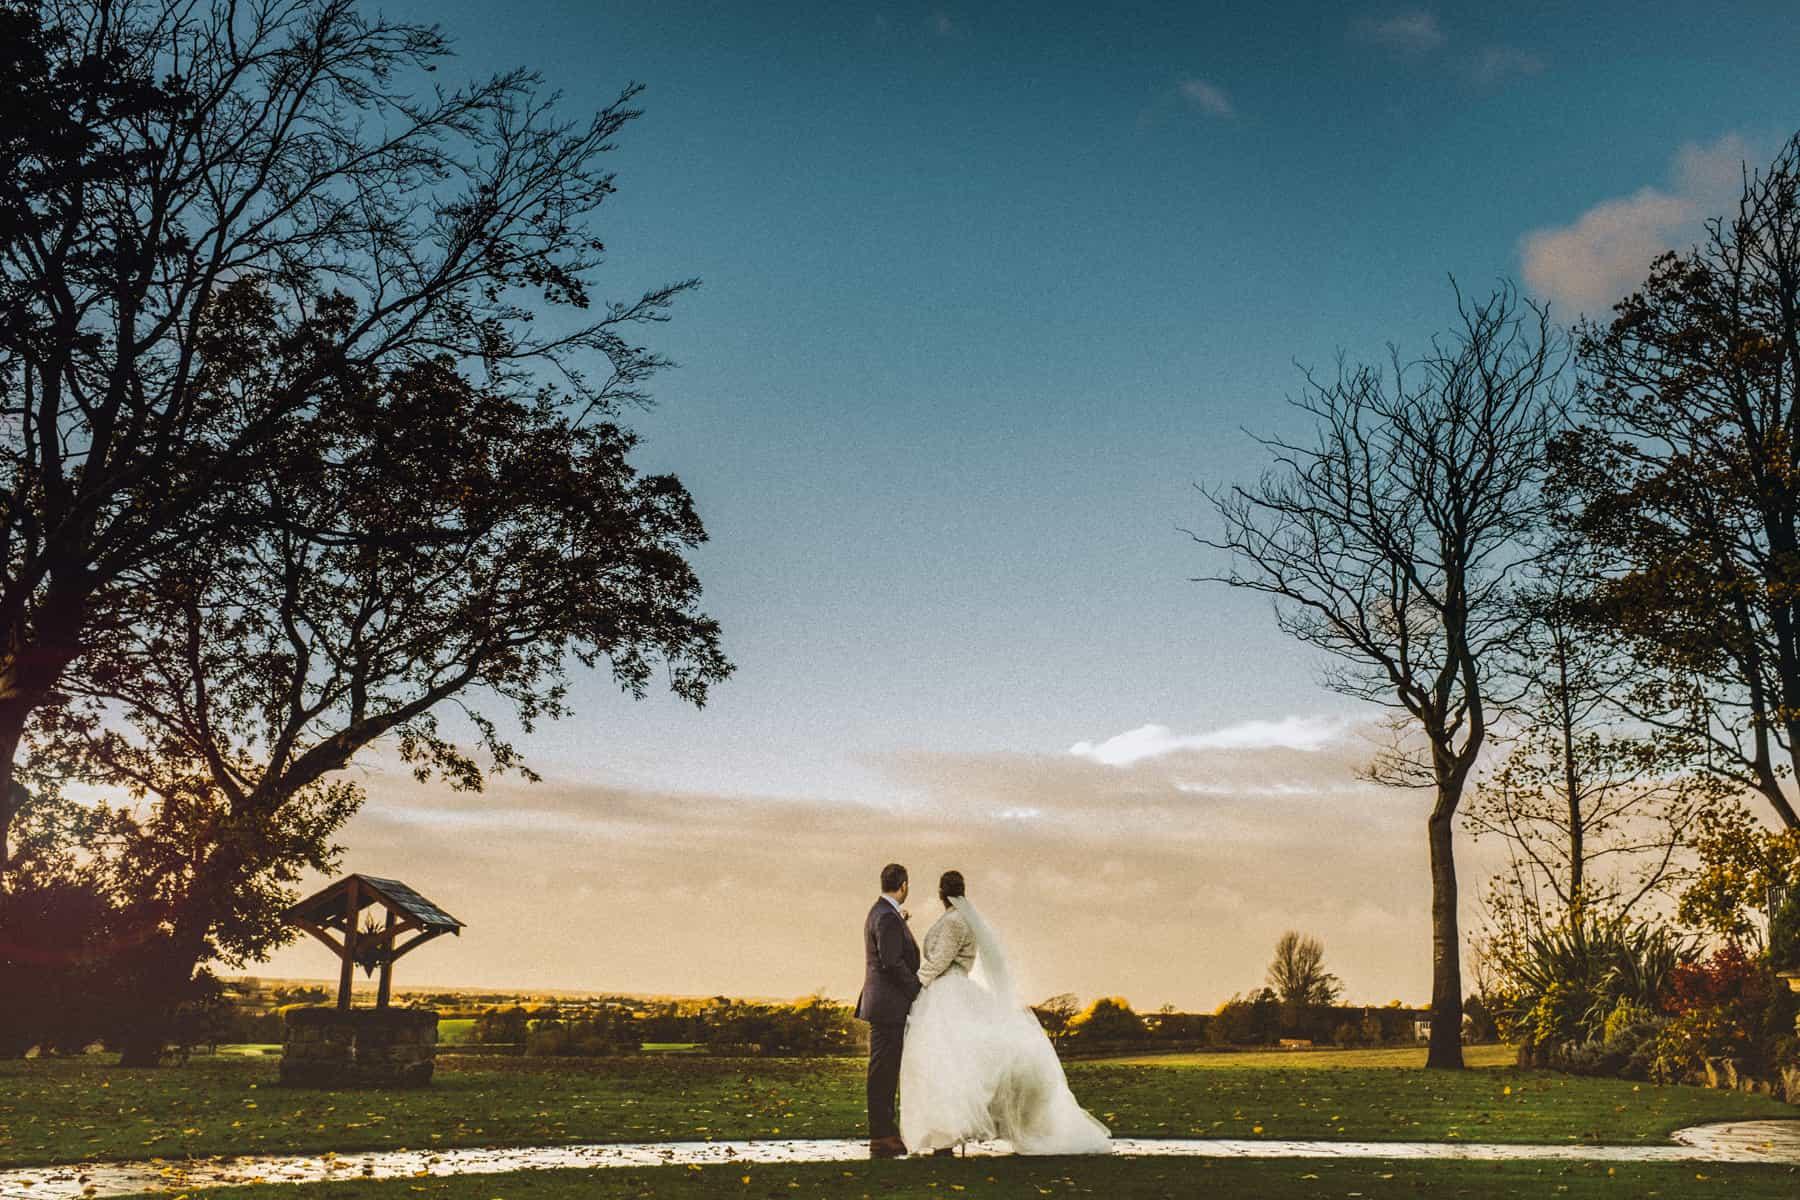 wedding photography bride and groom portraits (1 of 1)